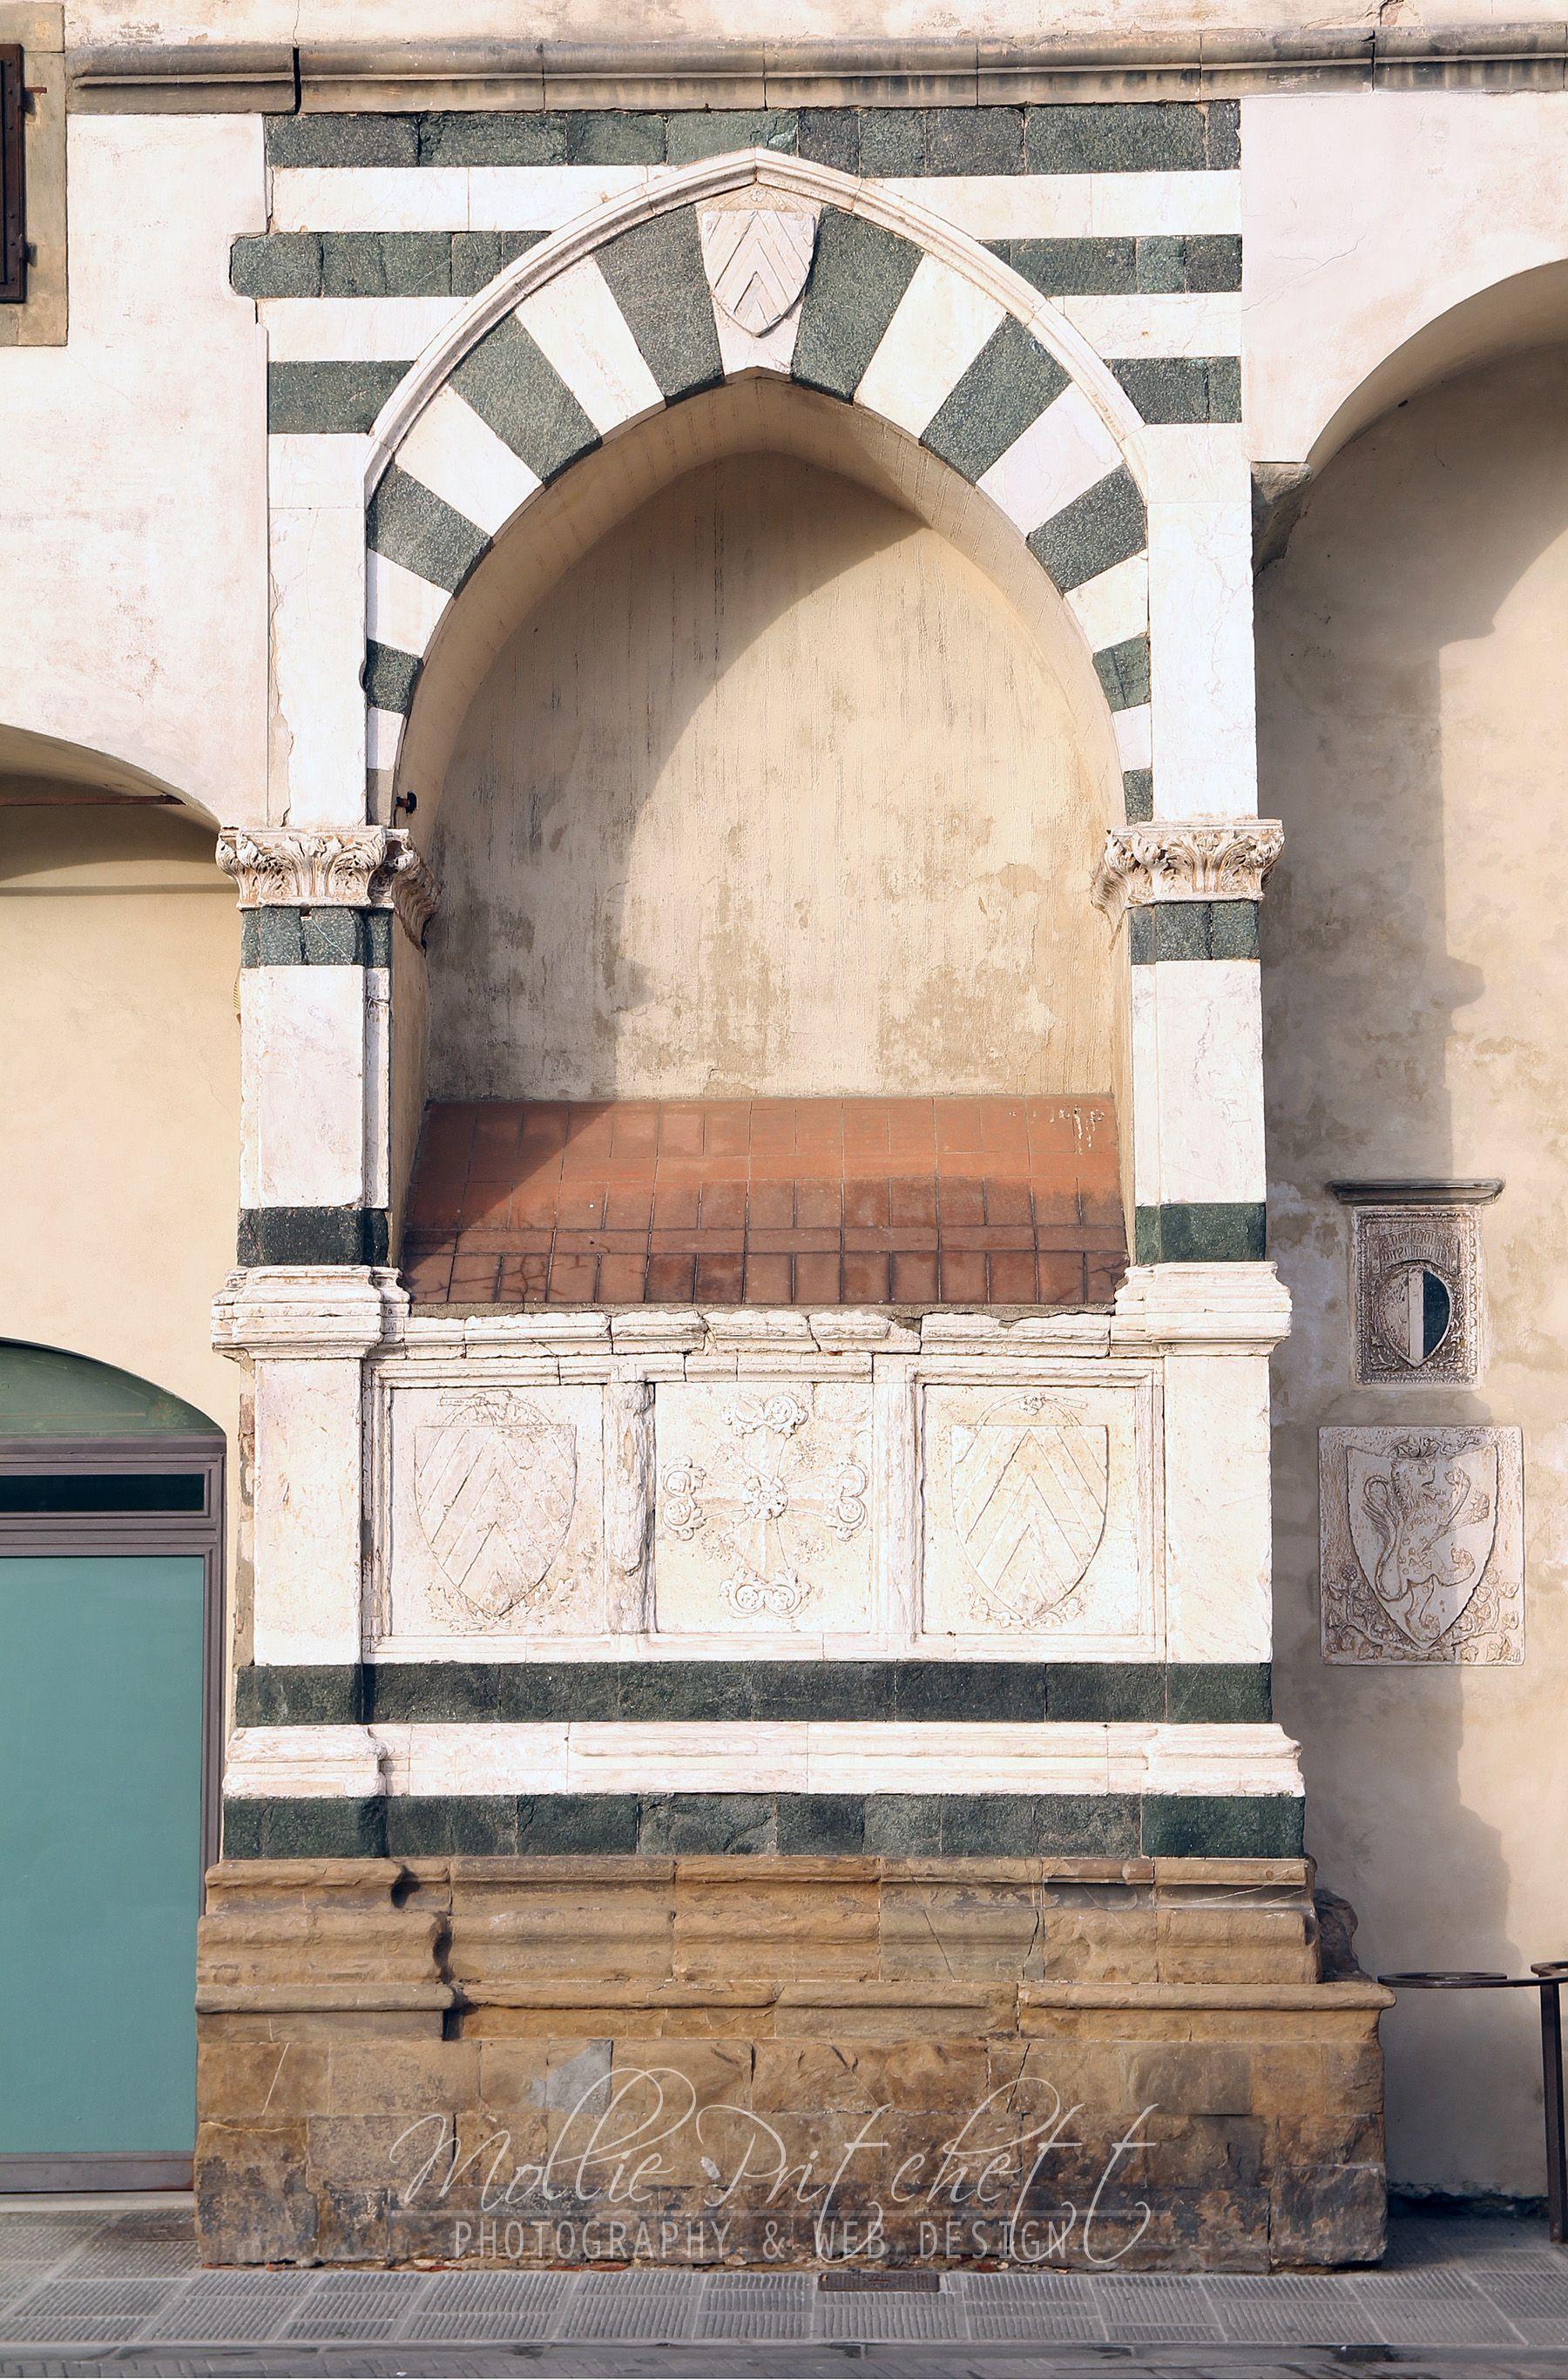 Piazza Santa Maria Novella, Florence, Italy Mollie Pritchett Photograpy & Web Design www.molliepritchett.com